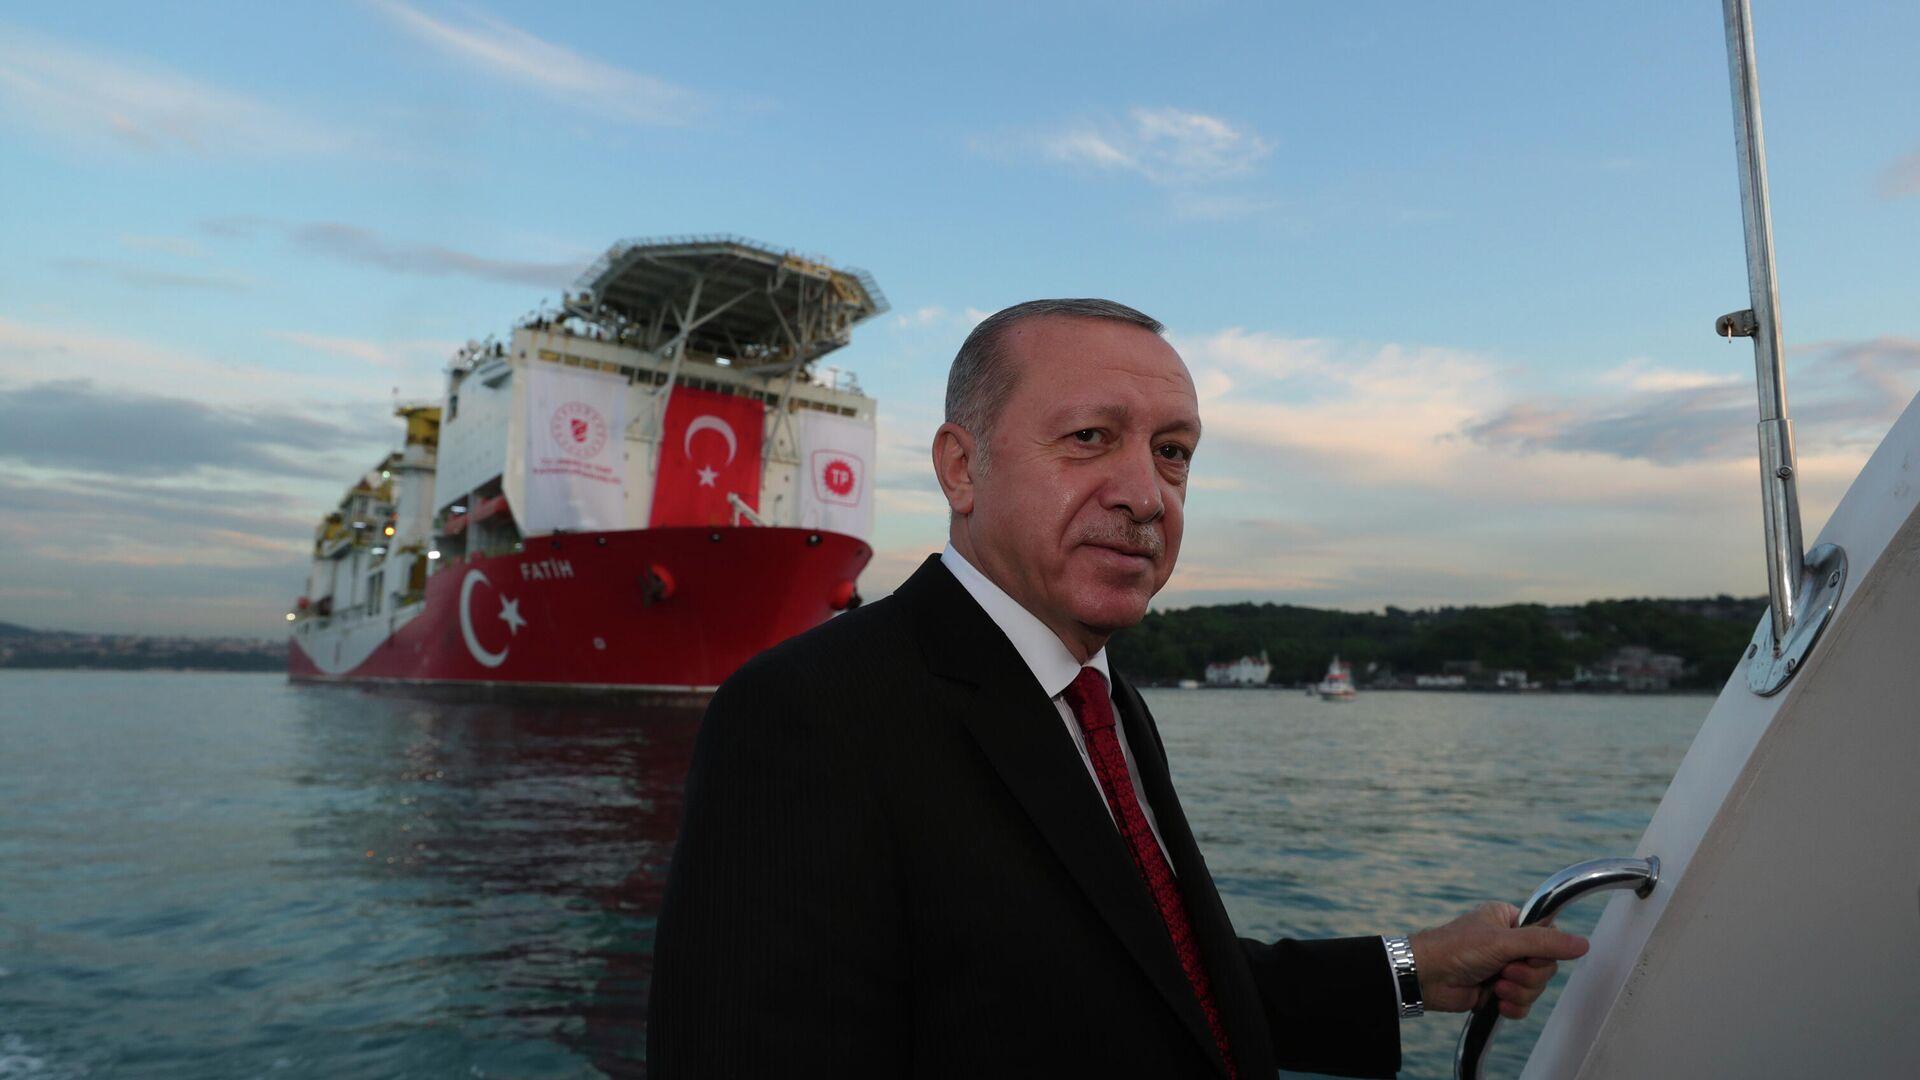 Президент Турции Реджеп Тайип Эрдоган на фоне турецкого корабля Фатих, проходящего пролив Босфор в Стамбуле - РИА Новости, 1920, 11.06.2021